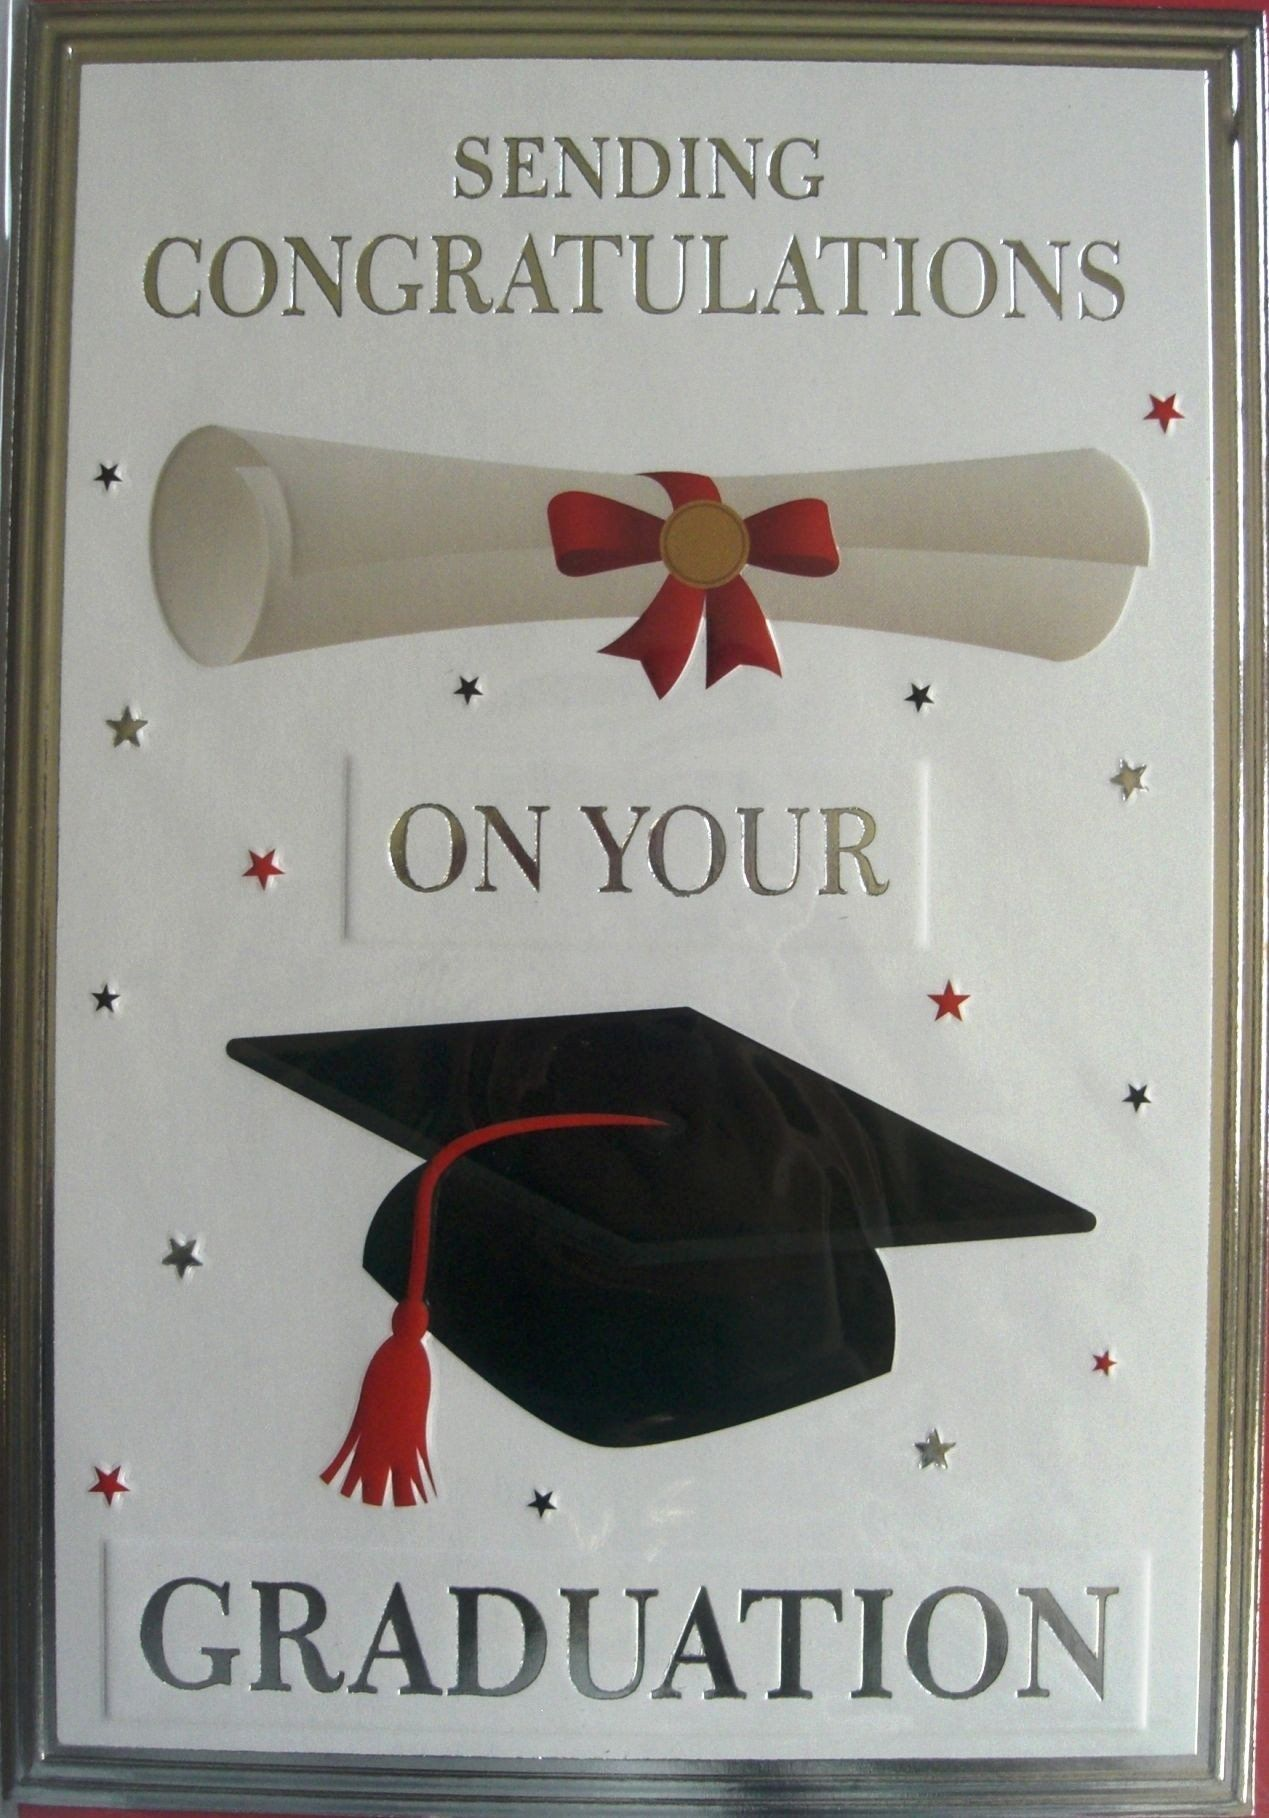 Congratulations Graduation Card Template Inspirational Send A Birthday Card Uk Congra Congratulations Graduate Graduation Card Templates Funny Graduation Cards